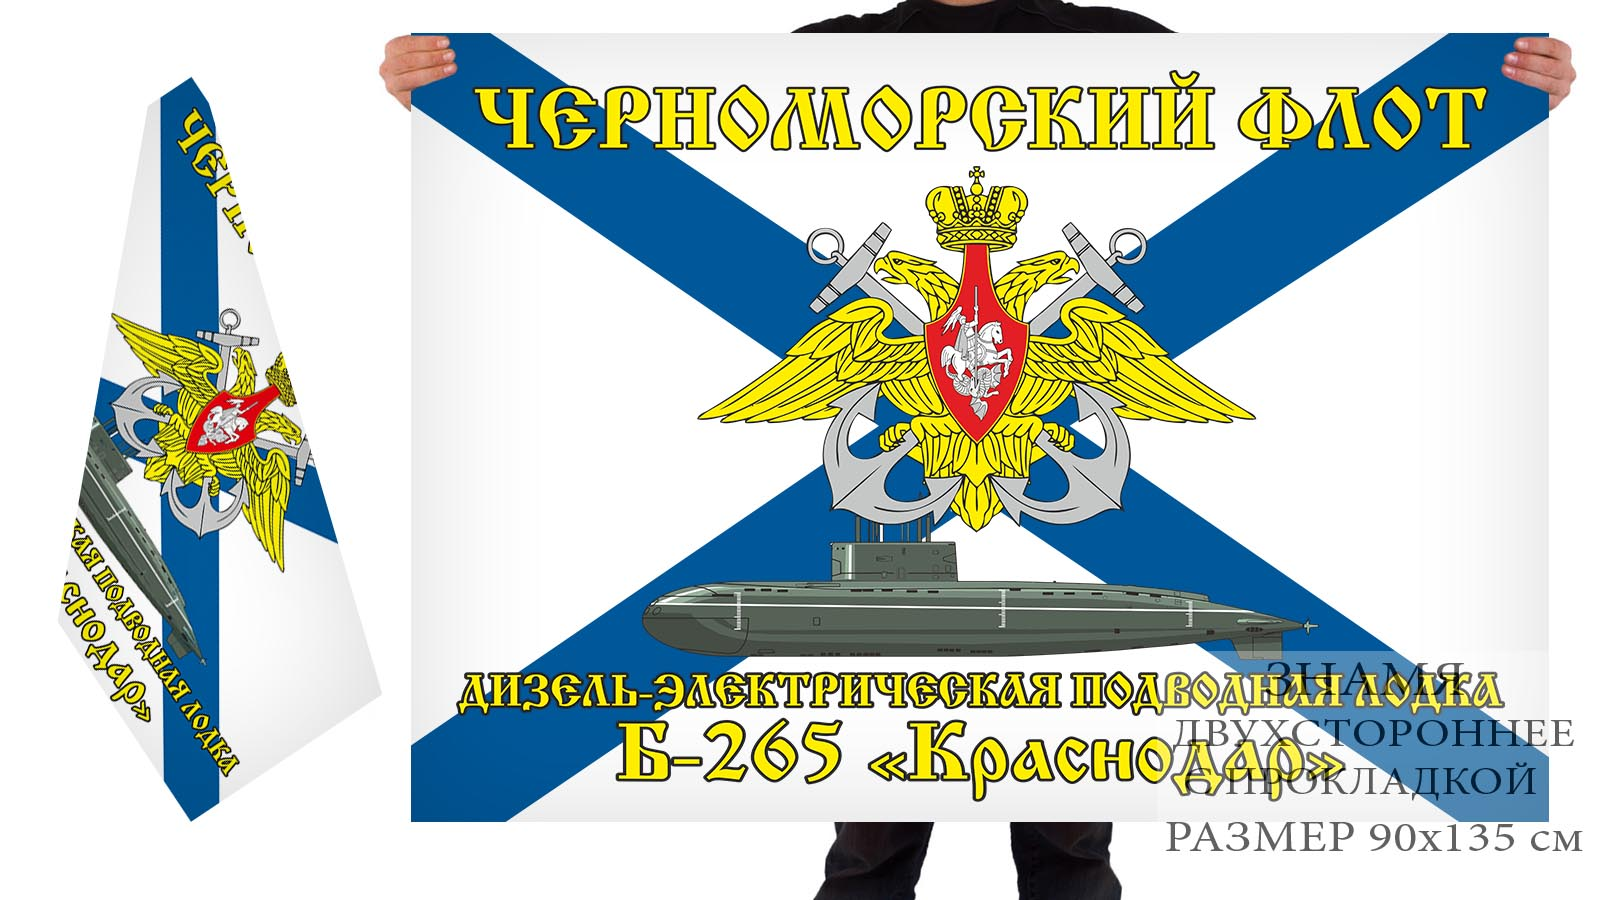 Двустороний флаг ДЭПЛ Б-265 «Краснодар»